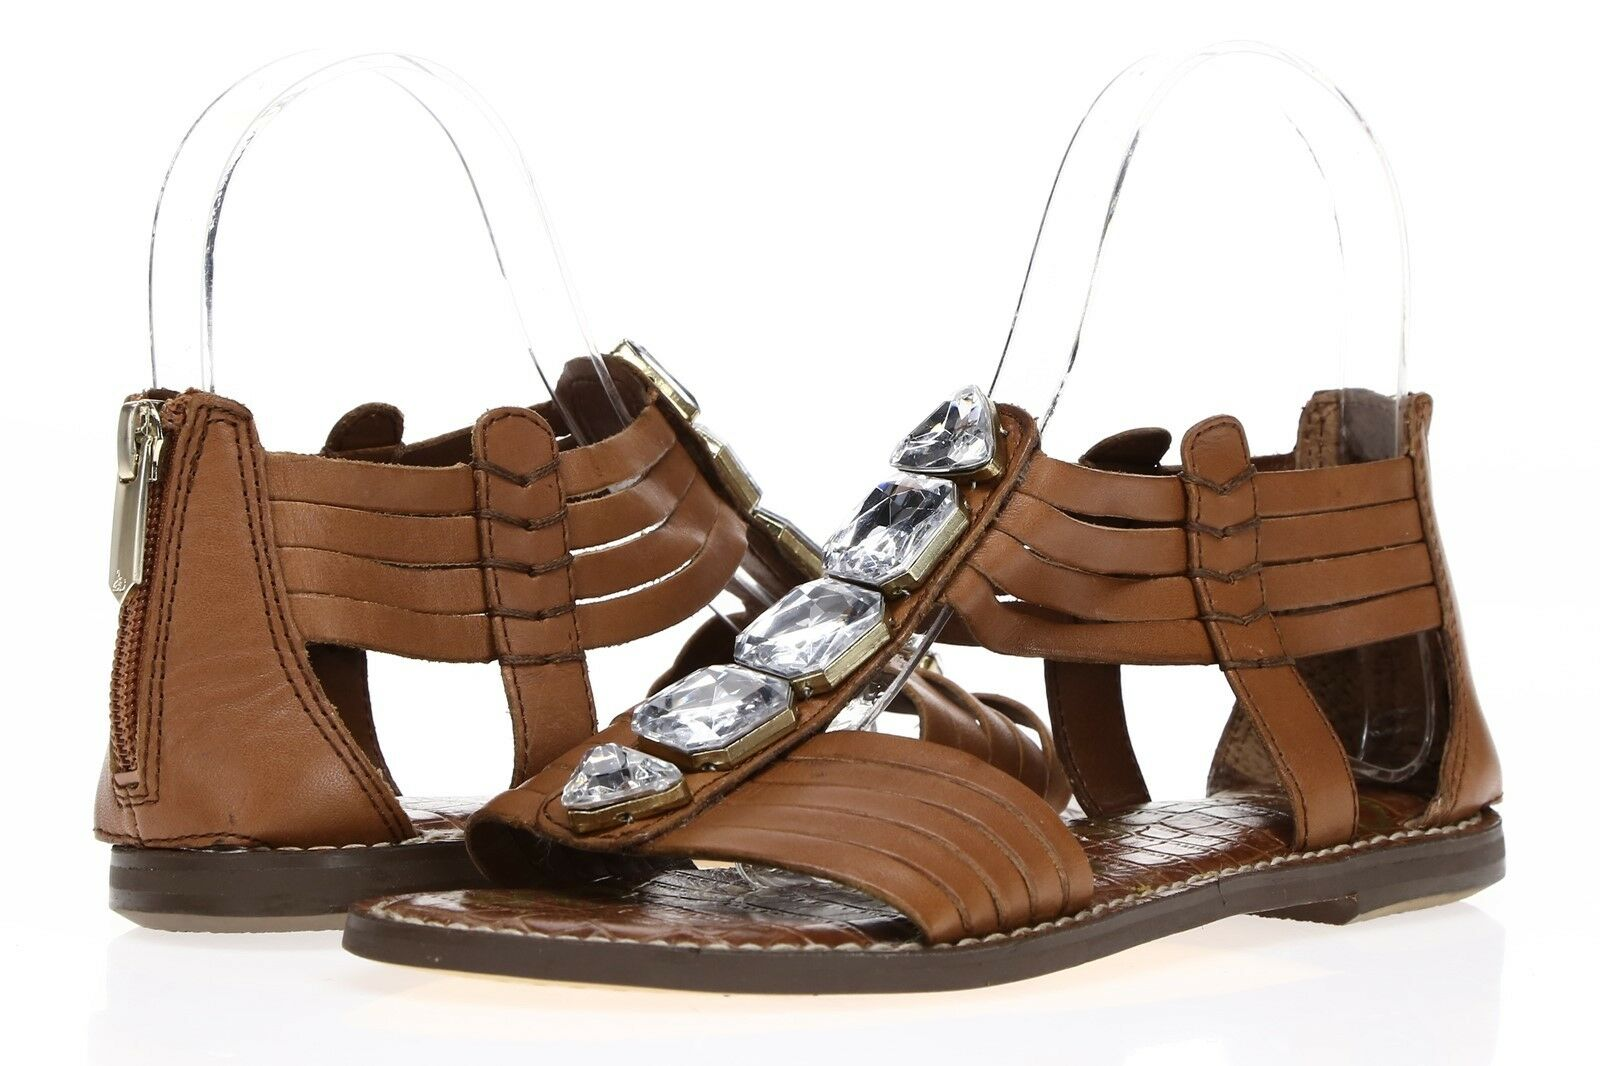 SAM EDELMAN Damenschuhe 'Galina' Braun Leder Crystal Embellished Sandales Sz 6